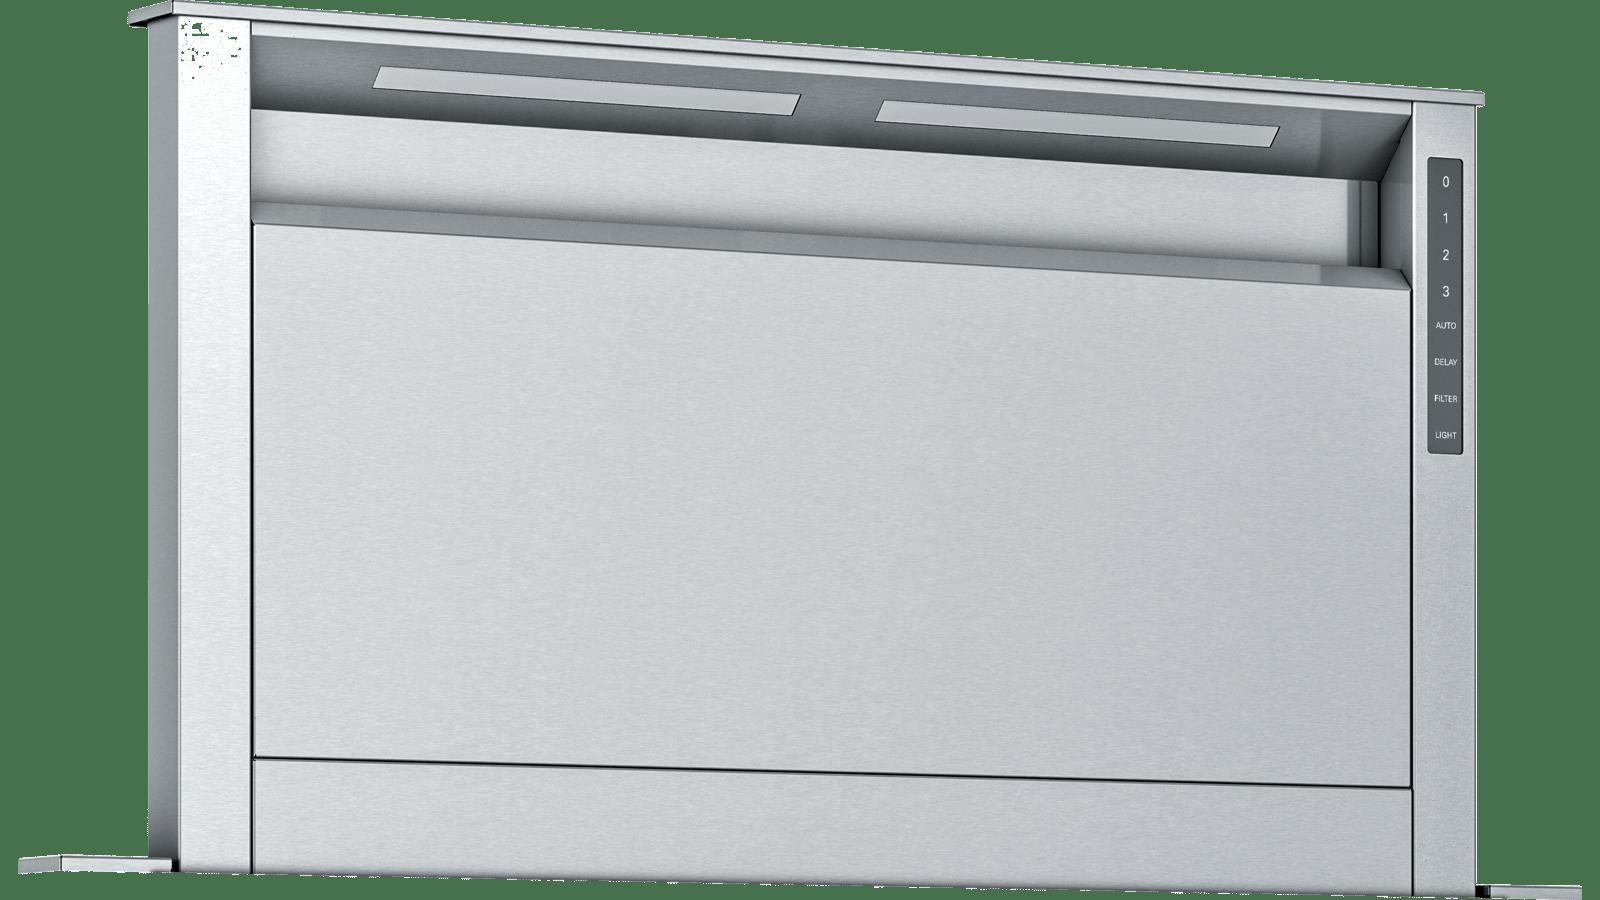 Thermador Ucvp36rs Downdraft Ventilation